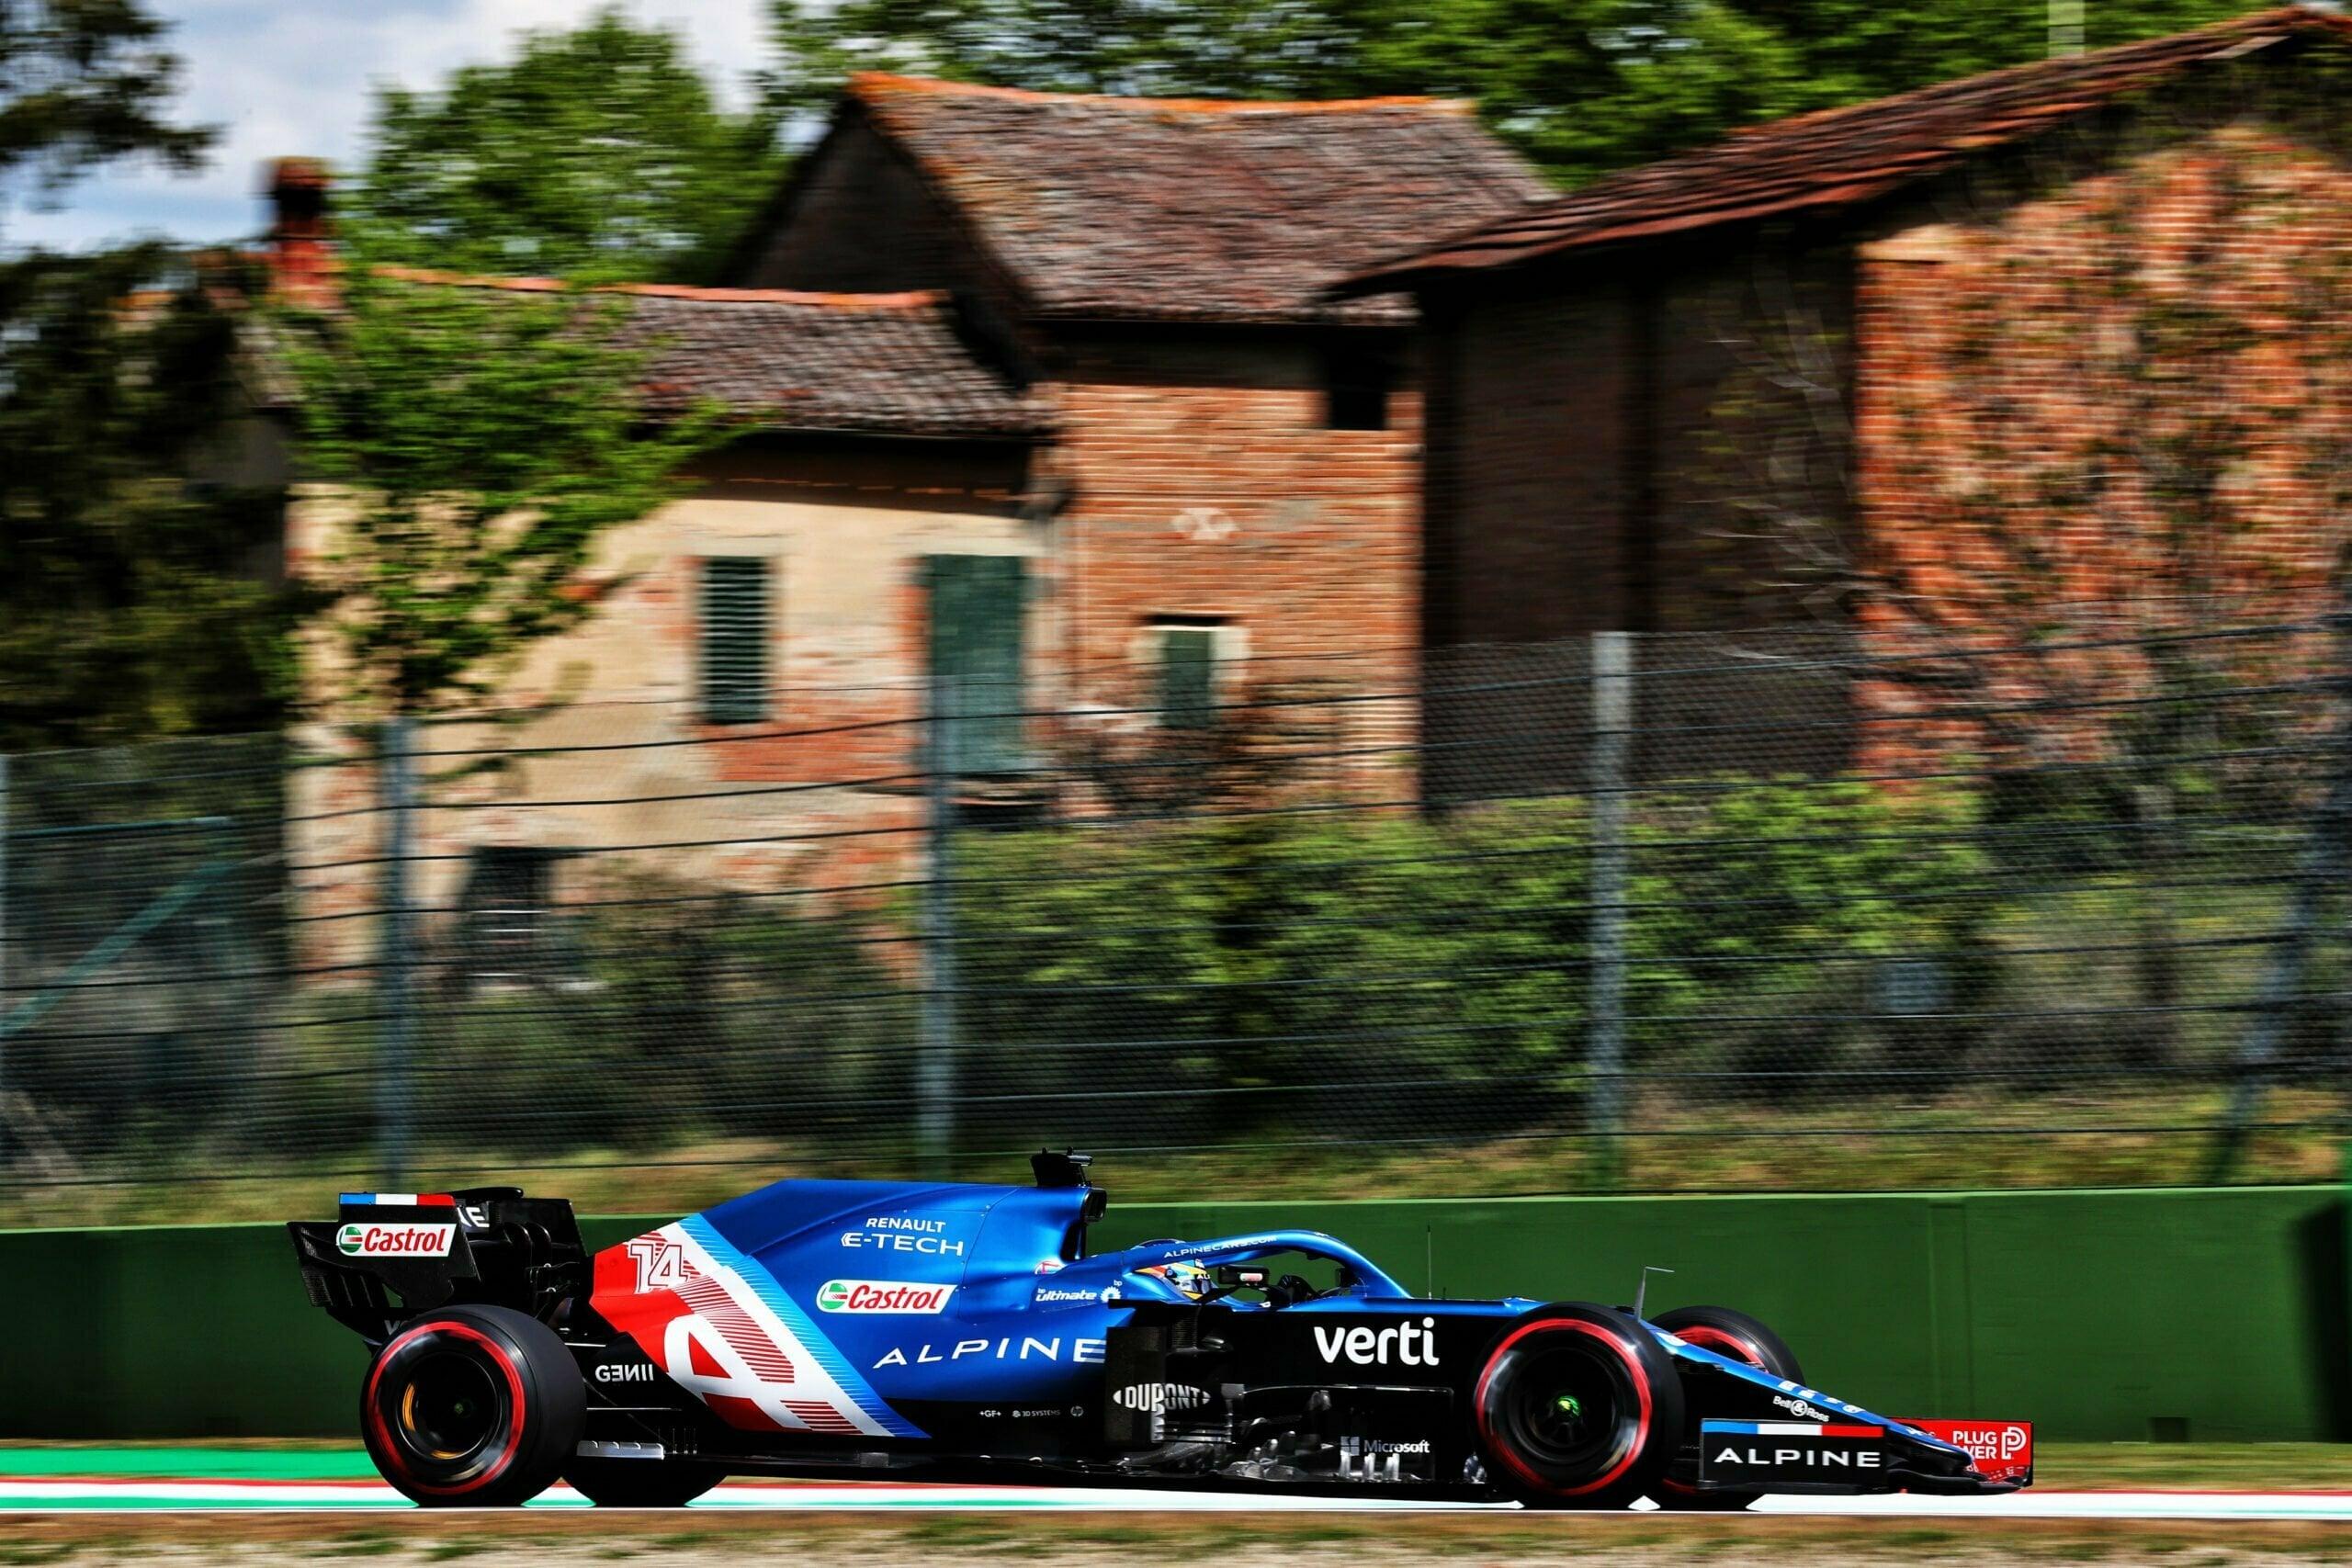 Alpine F1 Team A521 Alonso Ocon Brivio Permane Imola 2021 Test 28 scaled   Alpine F1 Team : Ocon en Q3 et Alonso en Q2 au GP d'Emilie Romagne